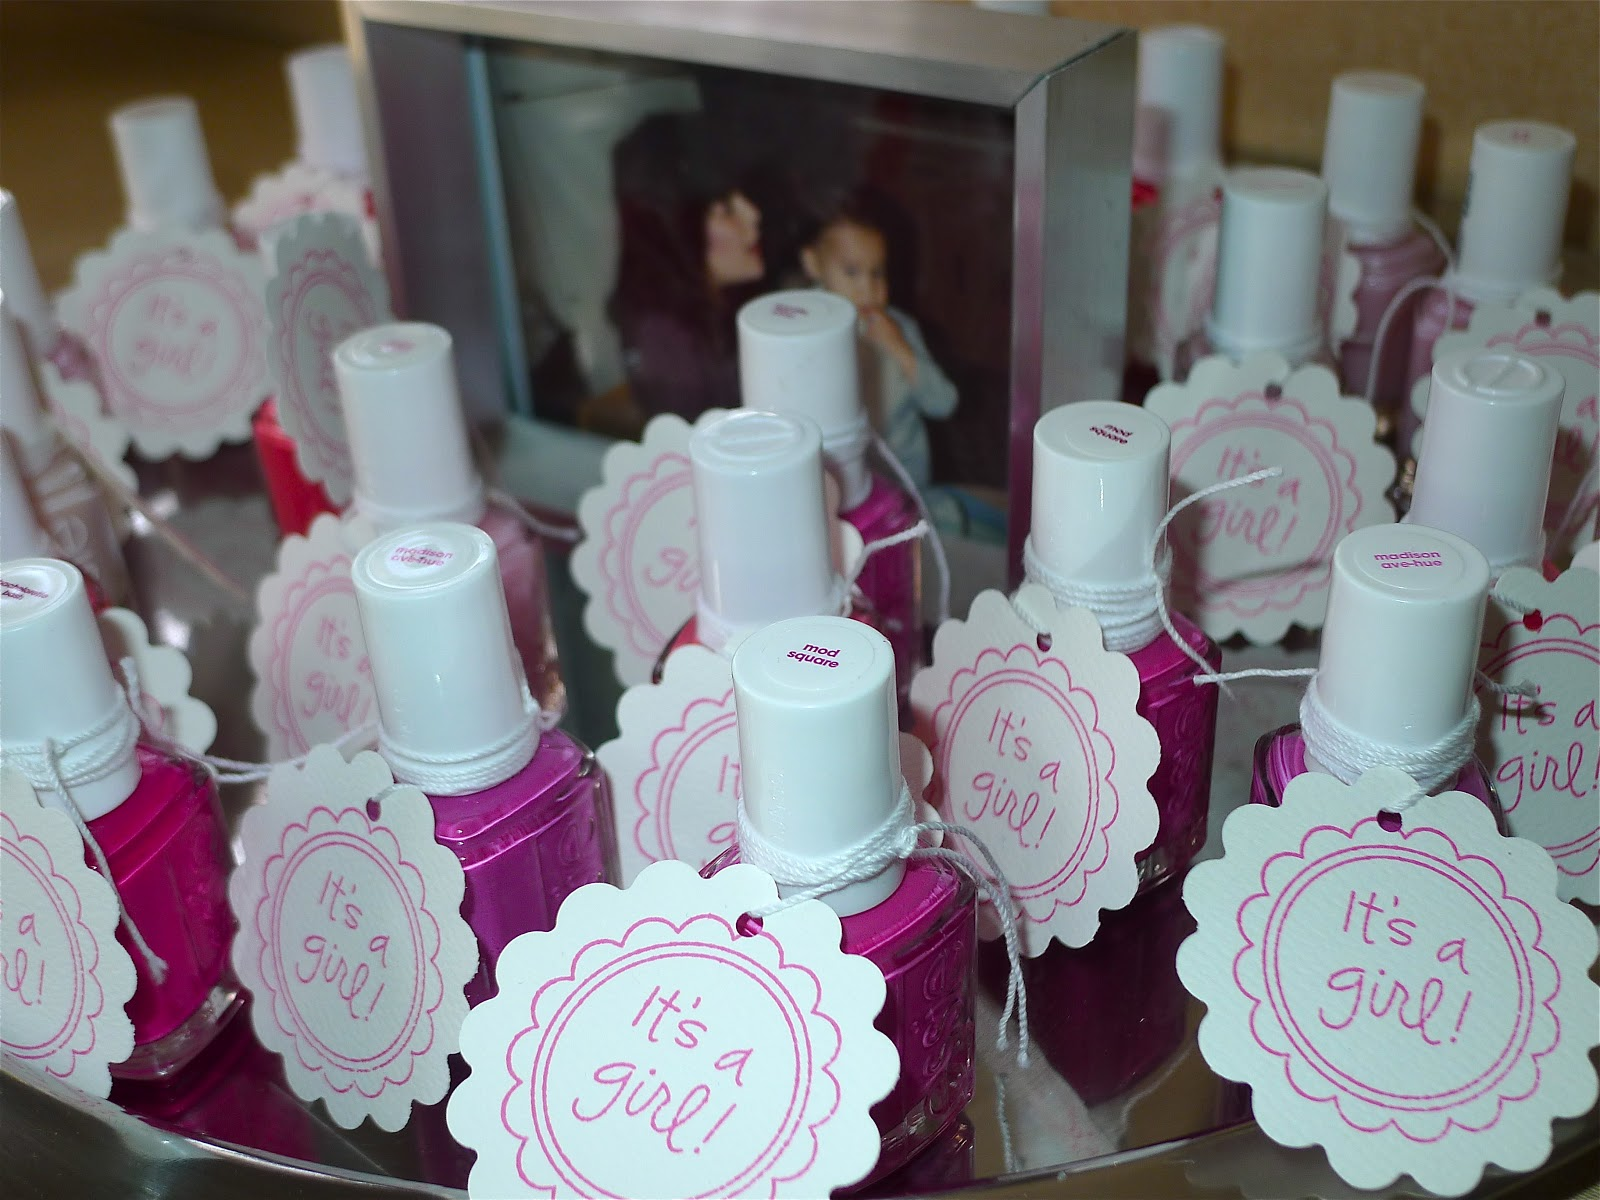 Fashionably Festive Pink Baby Shower DIY Towel Cake & Cupcakes